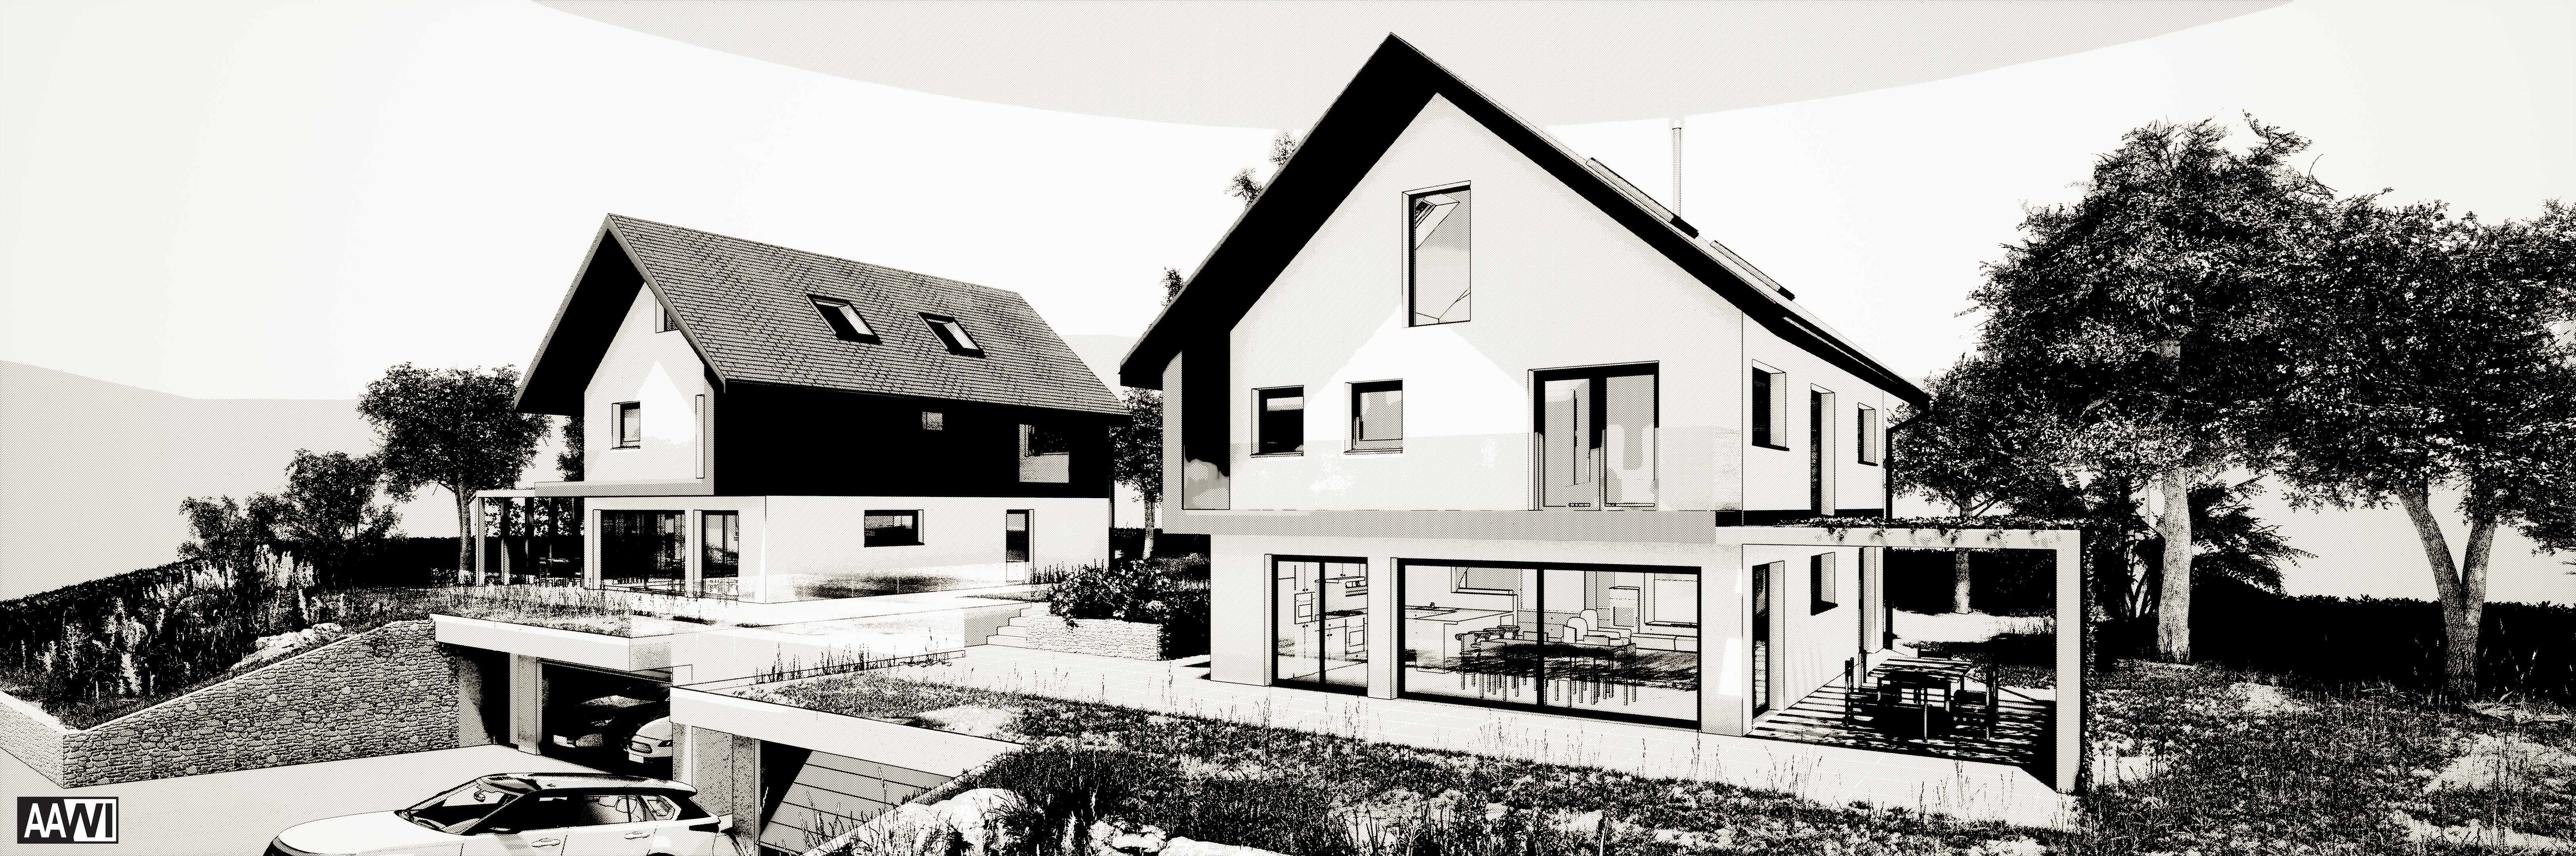 Villas jumelées